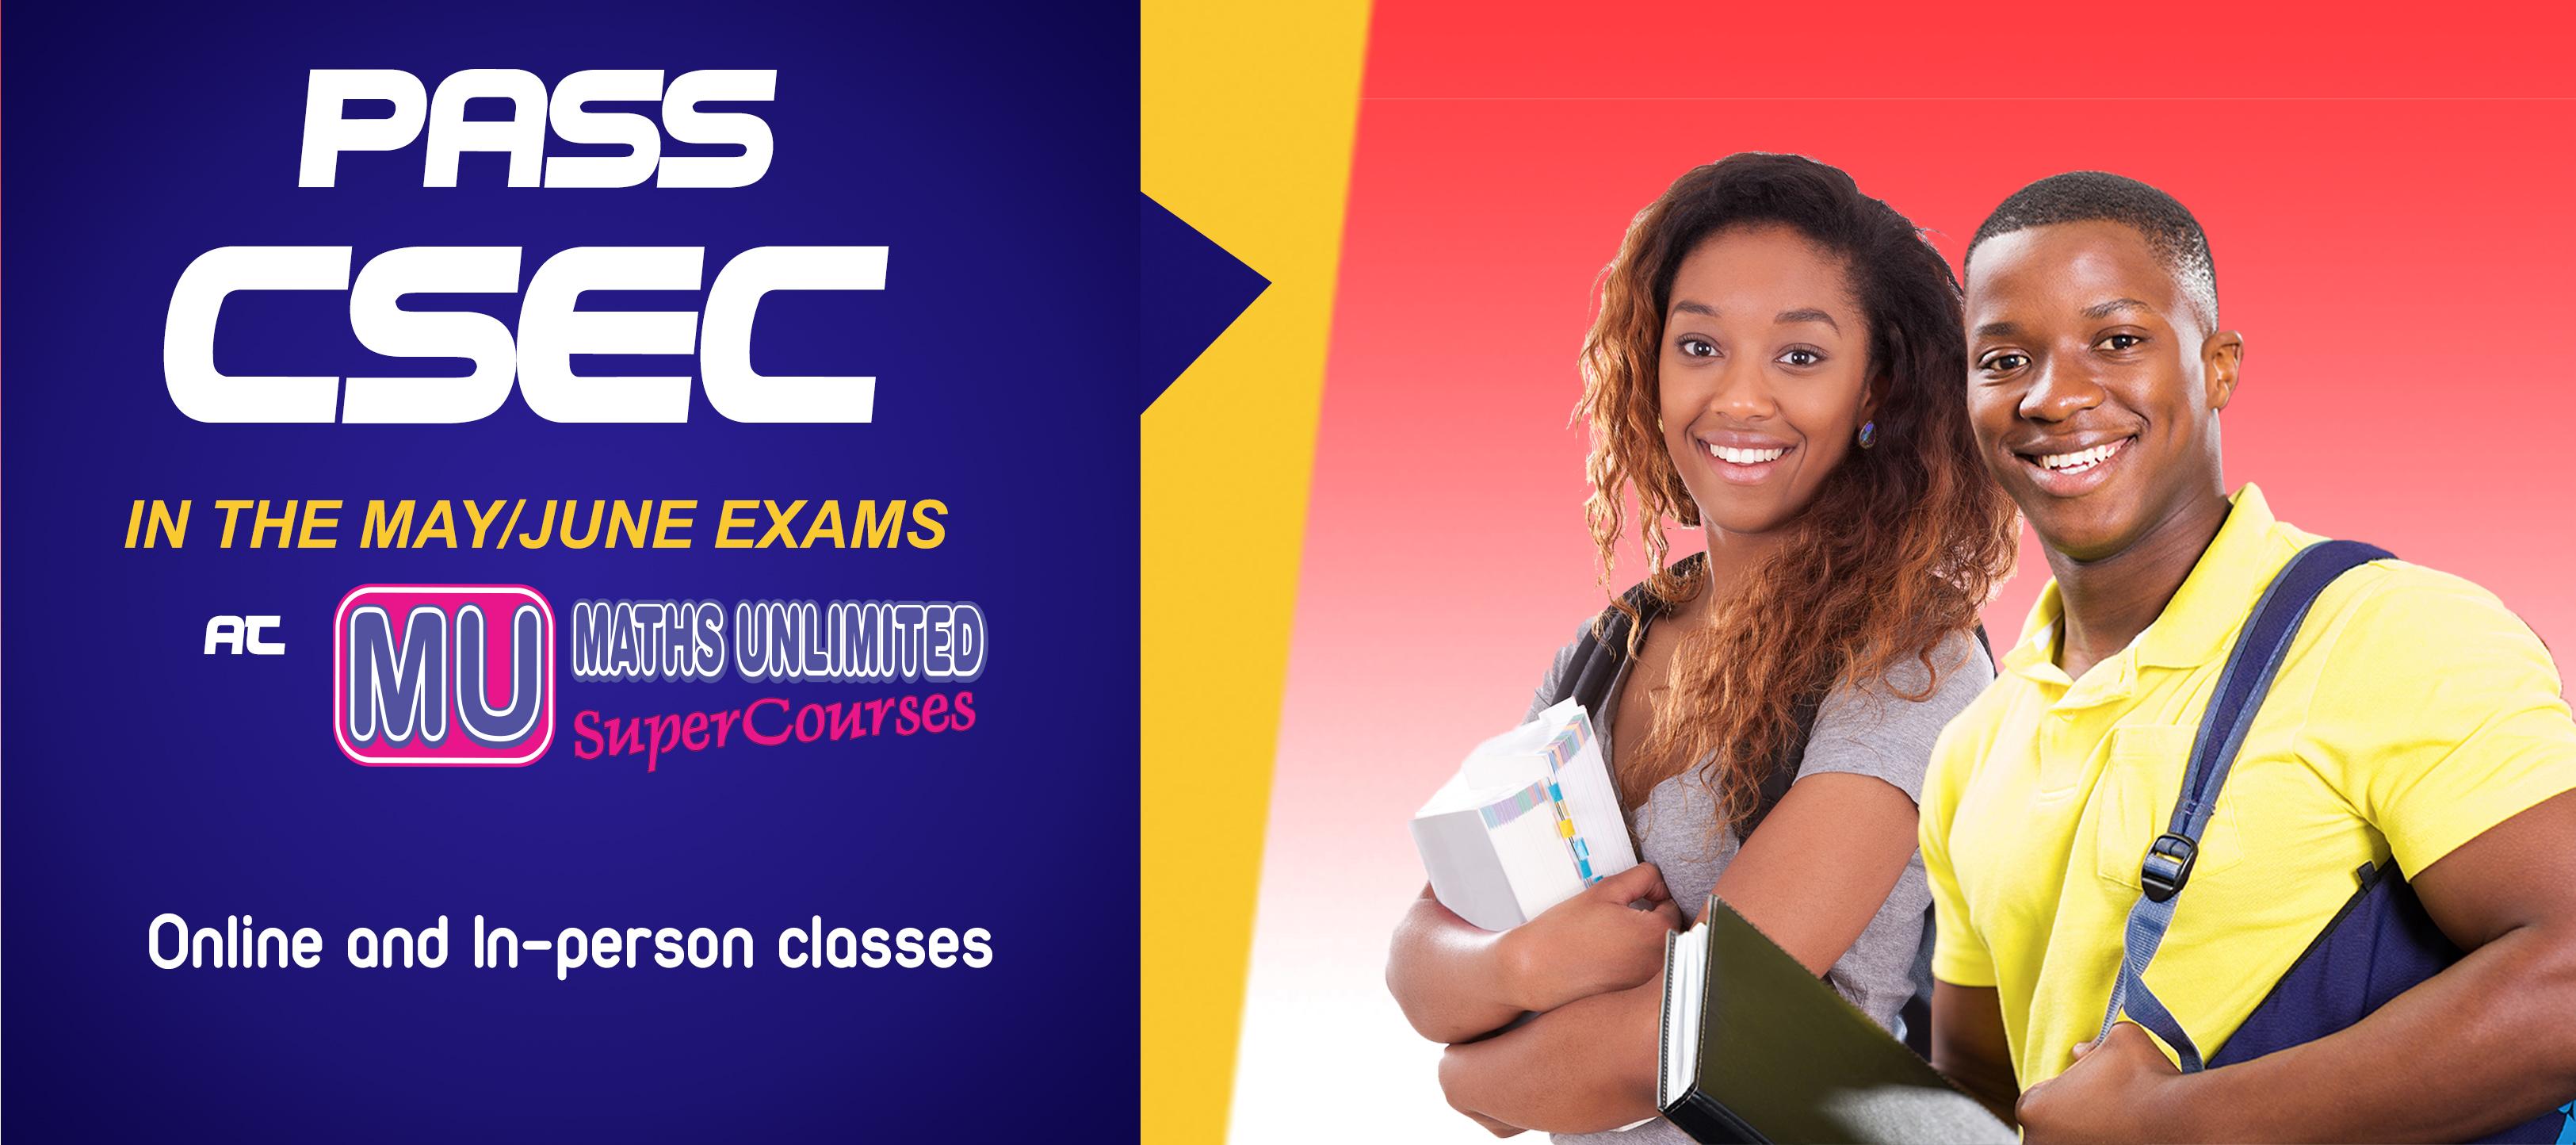 Pass CSEC